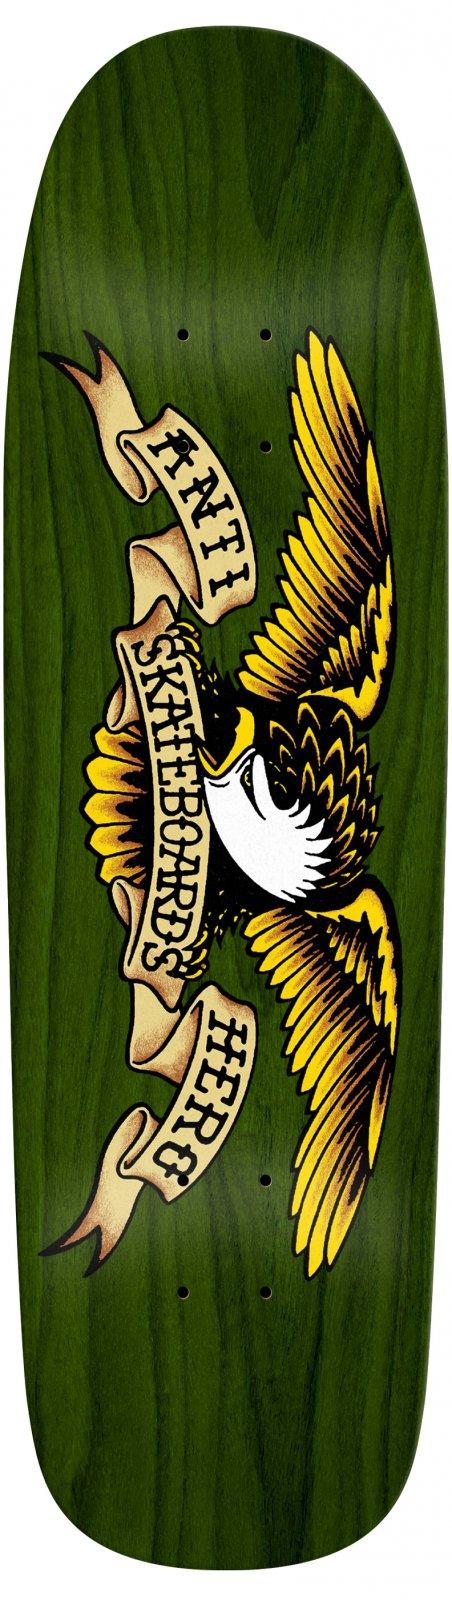 Antihero Green Giant Shaped Eagle 9.56 x 32.98